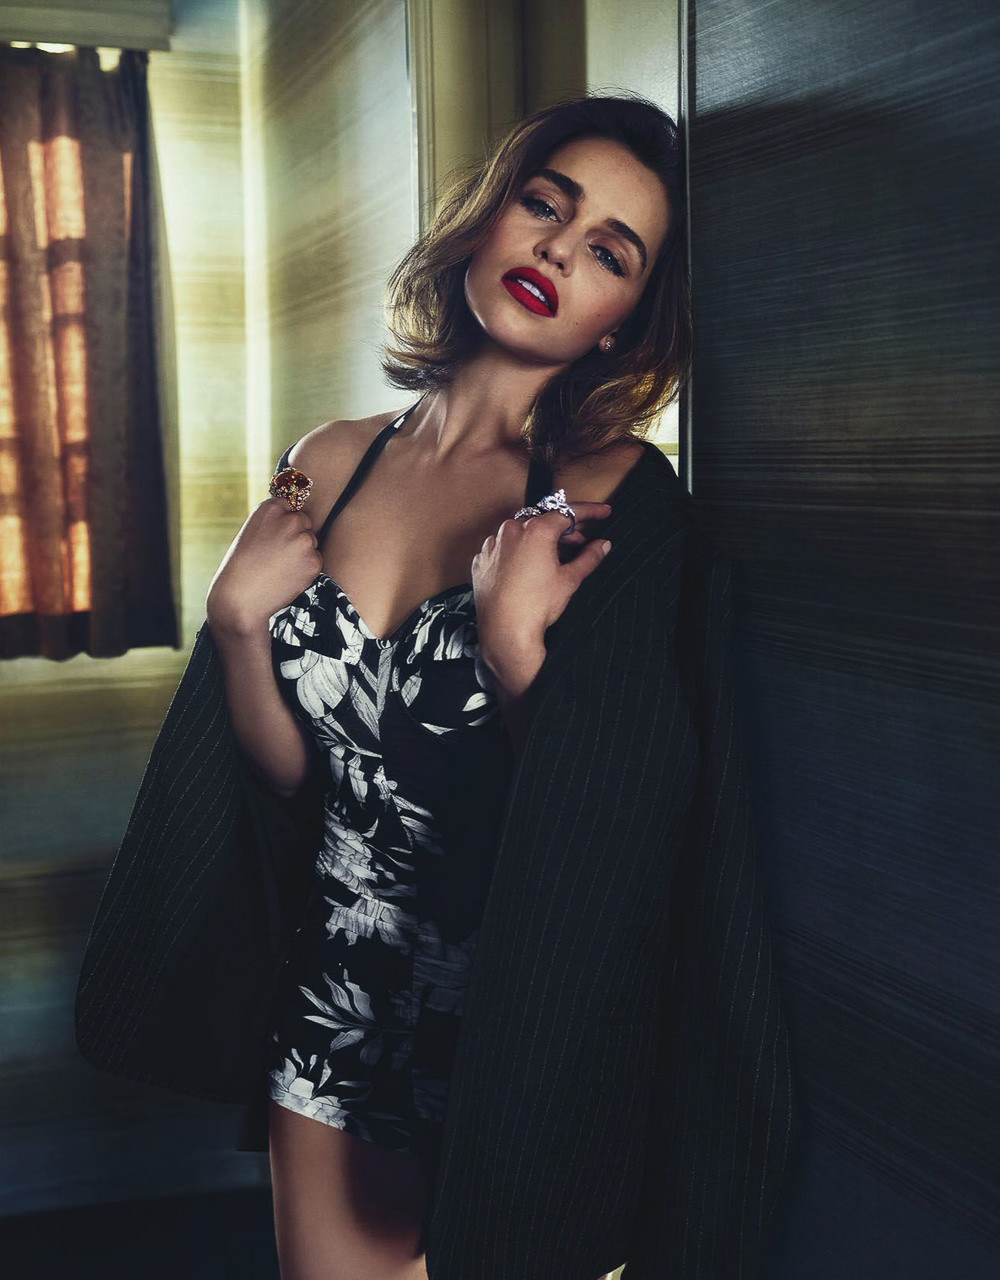 Vogue-Australia-May-2016-Emilia-Clarke-by-Emma-Summerton-1-2